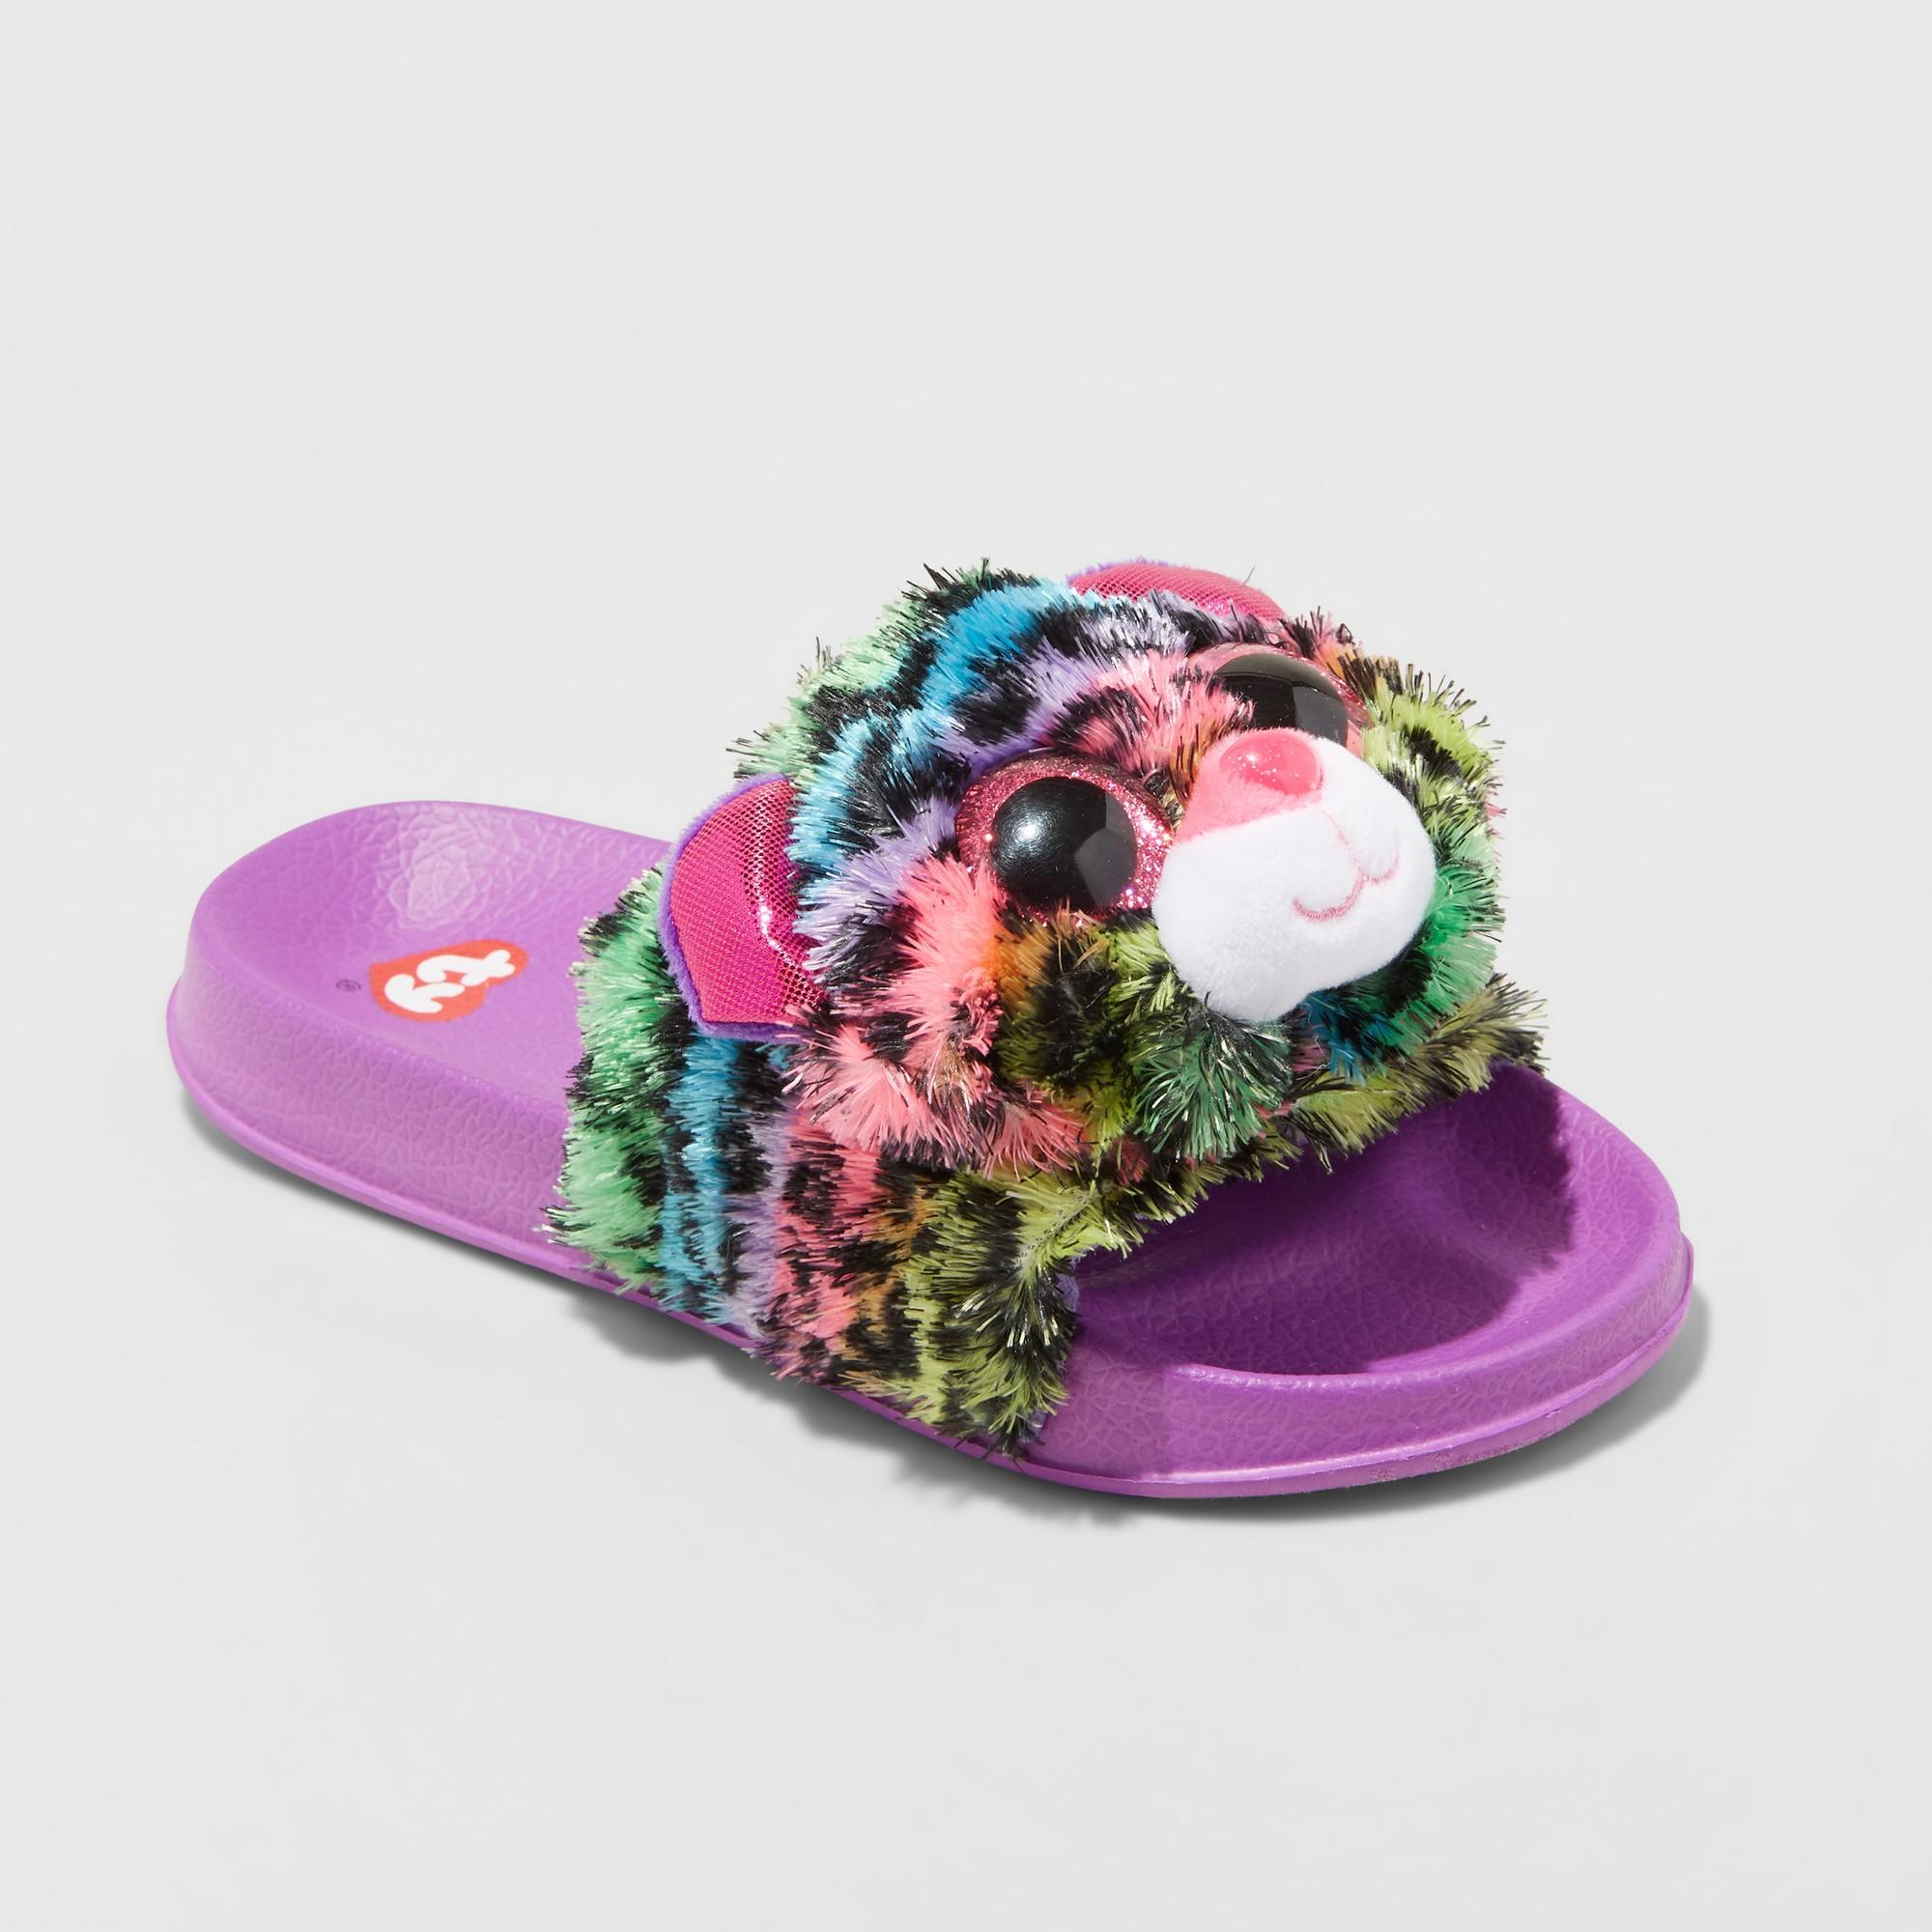 Girls  Dotty Beanie BoosPool Slided Slippers - Purple XS Ty Beanie Boos 3f0cda177b47